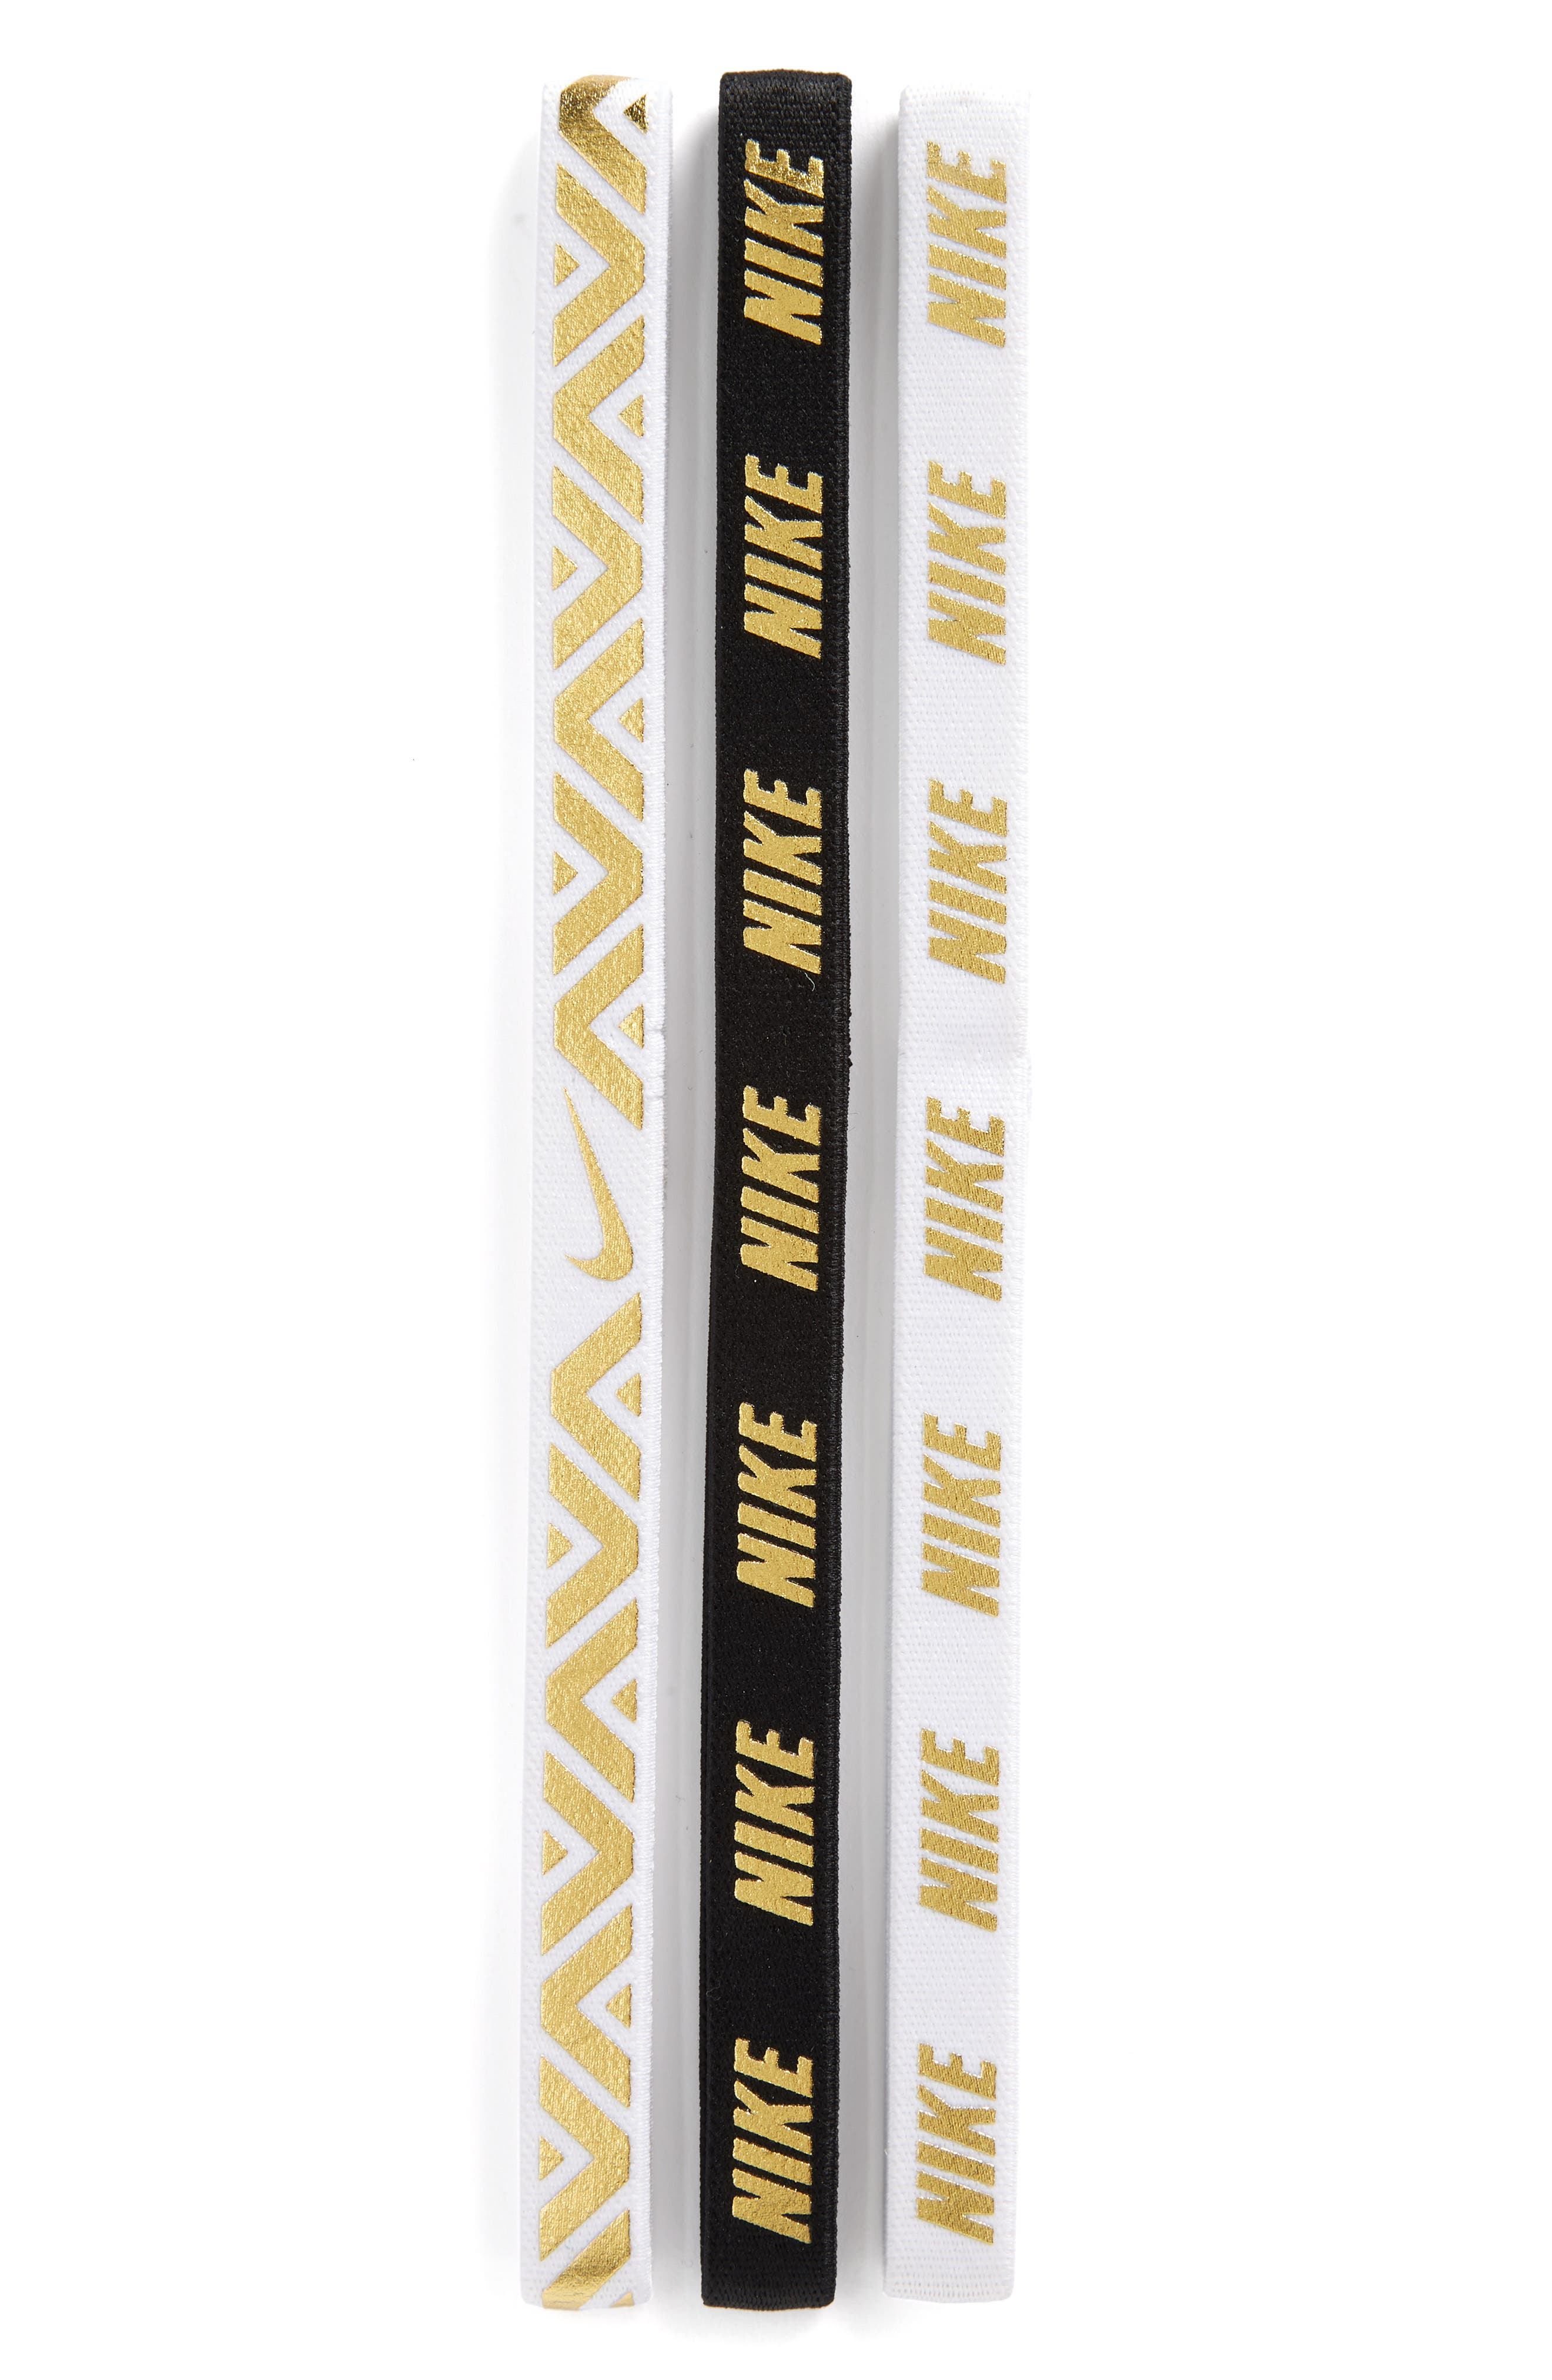 3-Pack Headbands,                             Main thumbnail 1, color,                             White/ White/ Black